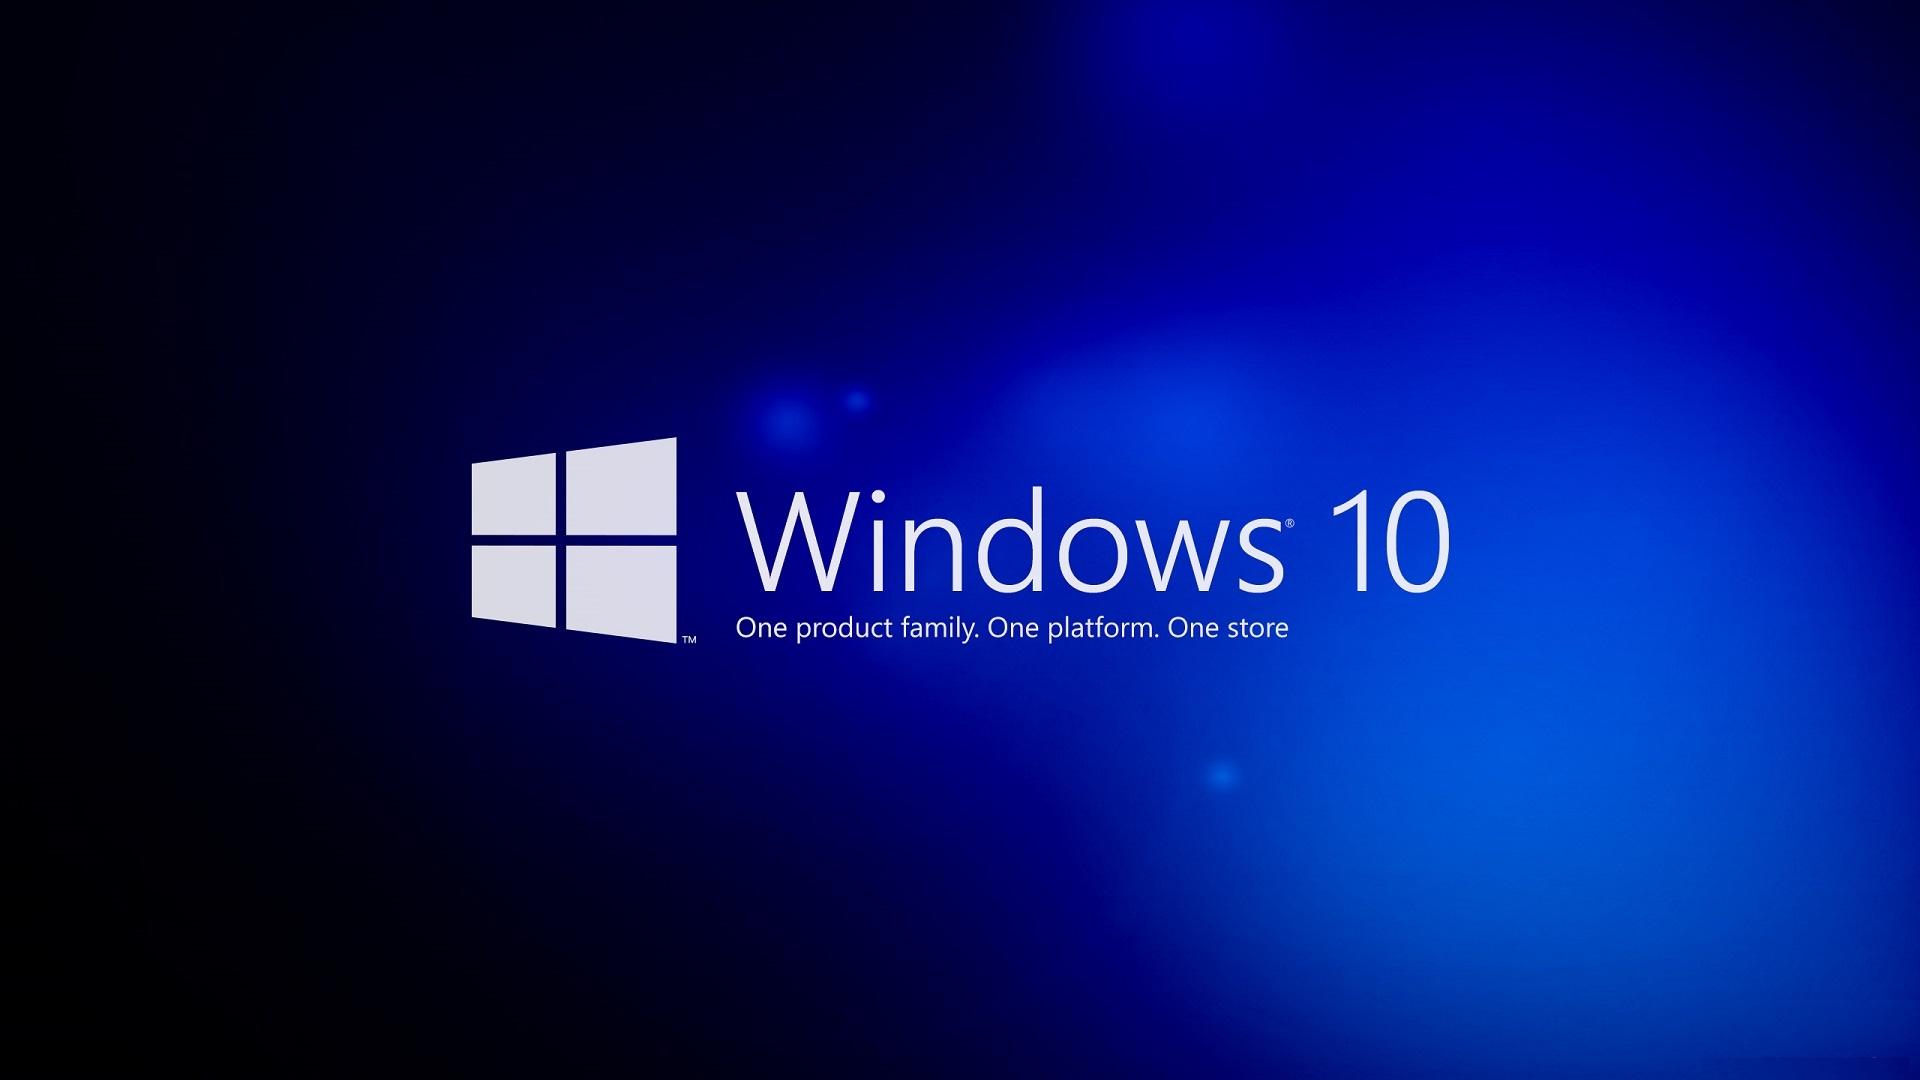 Cool Windows 10 Wallpaper